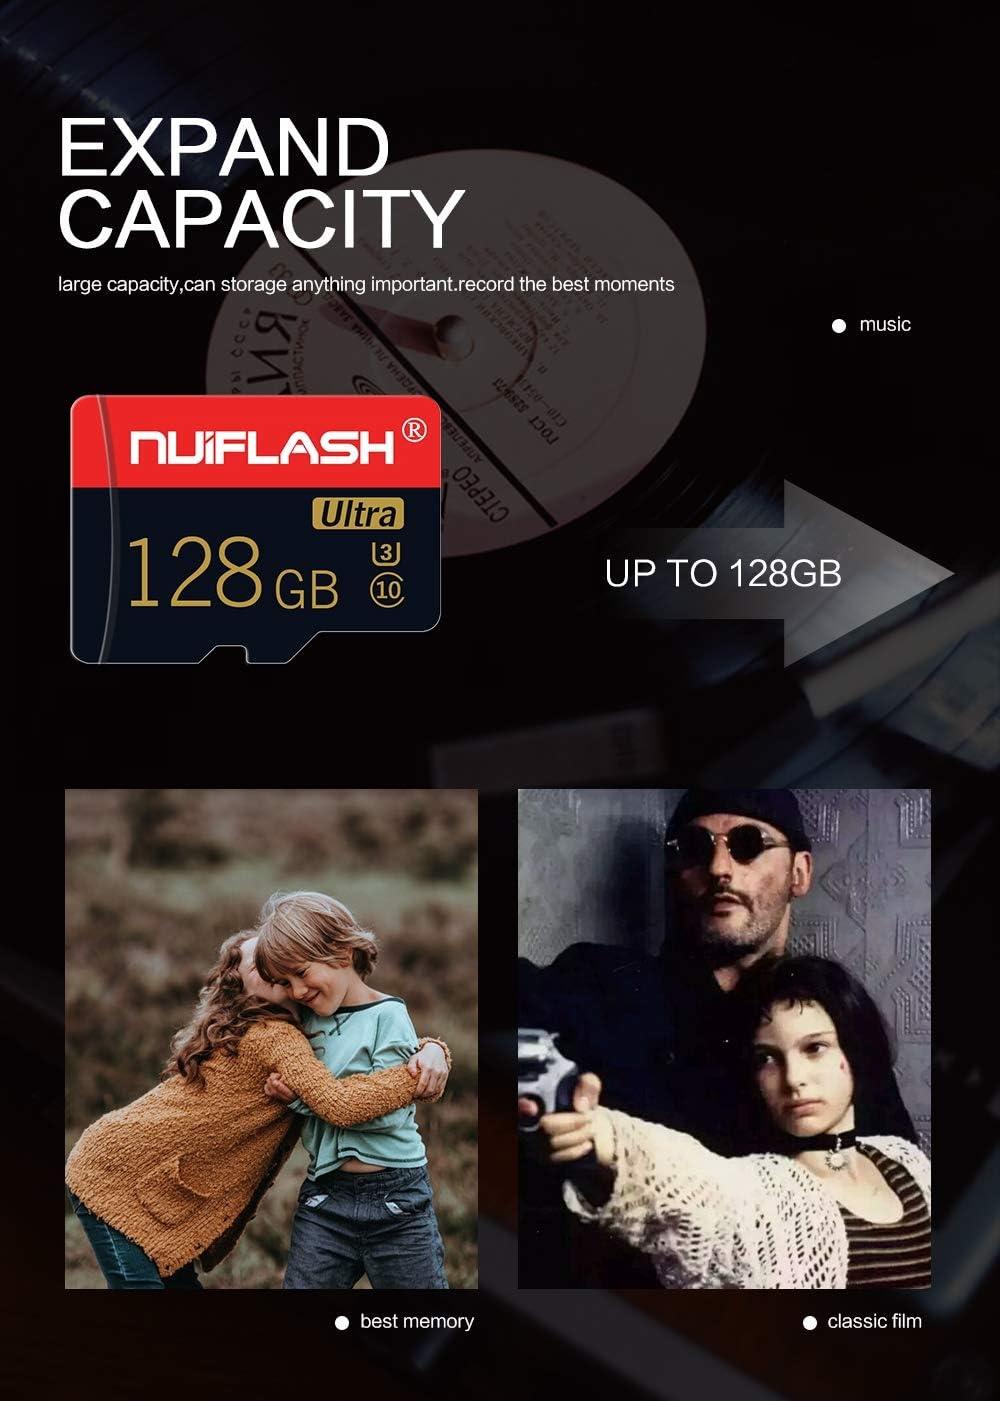 AZLMJXH High-Speed tf Card 32gb Mobile Phone Memory 64g Card Monitoring Memory Card 128g Memory Card sd Card,128G